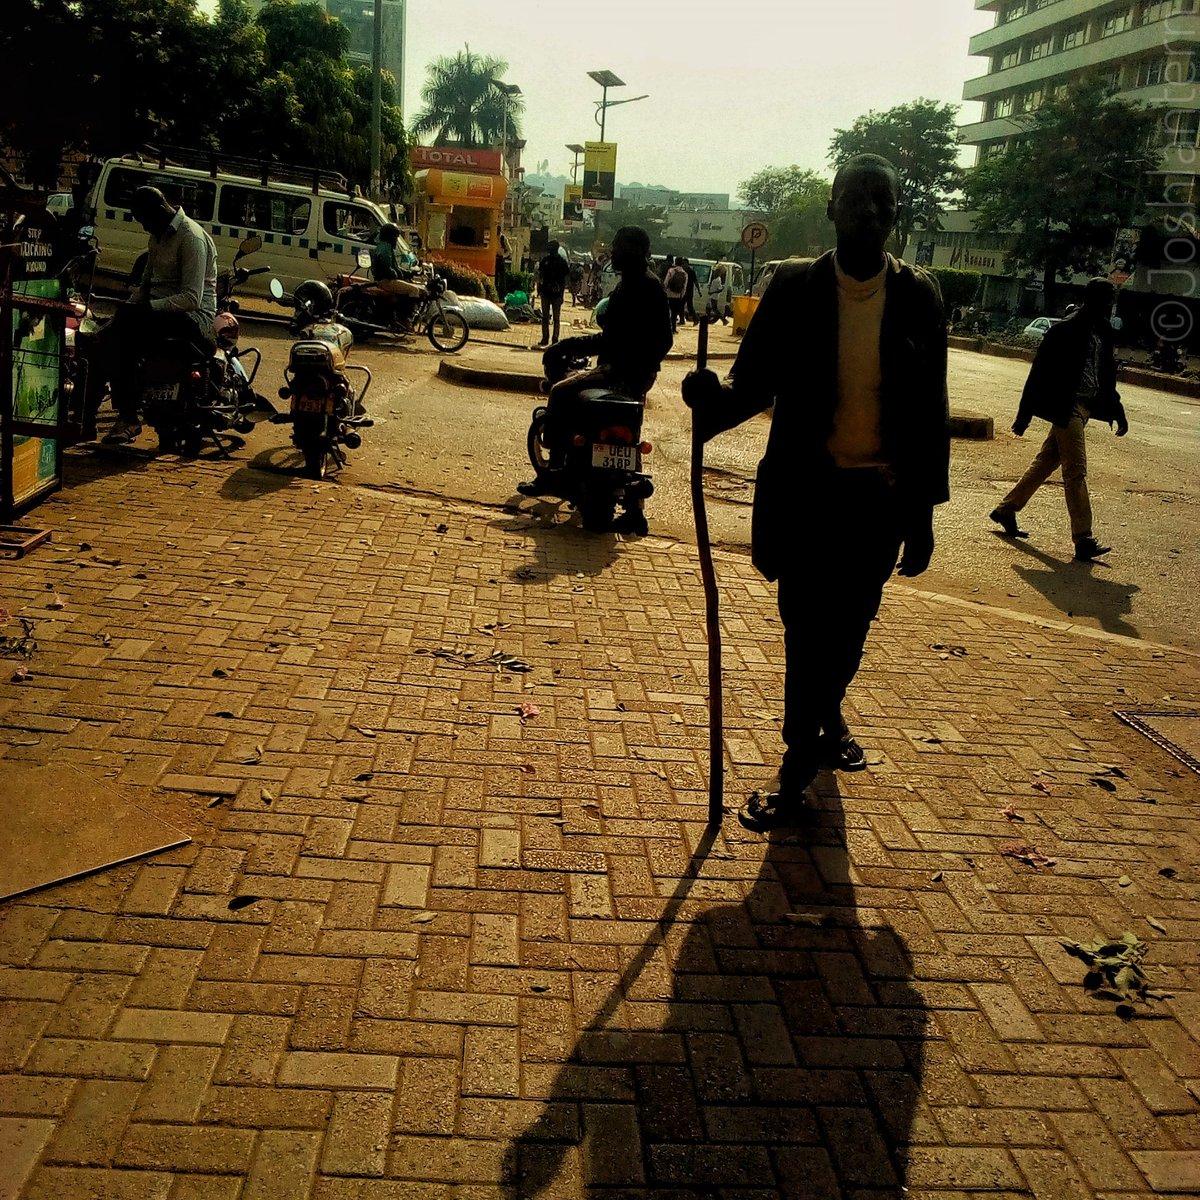 Life on the streets of Kampala. The morning photowalks .  . . . . . . Documentary #streetphotography #PhotoOftheDay  #EveryDayMotivationpic.twitter.com/ZWOVo75nIE